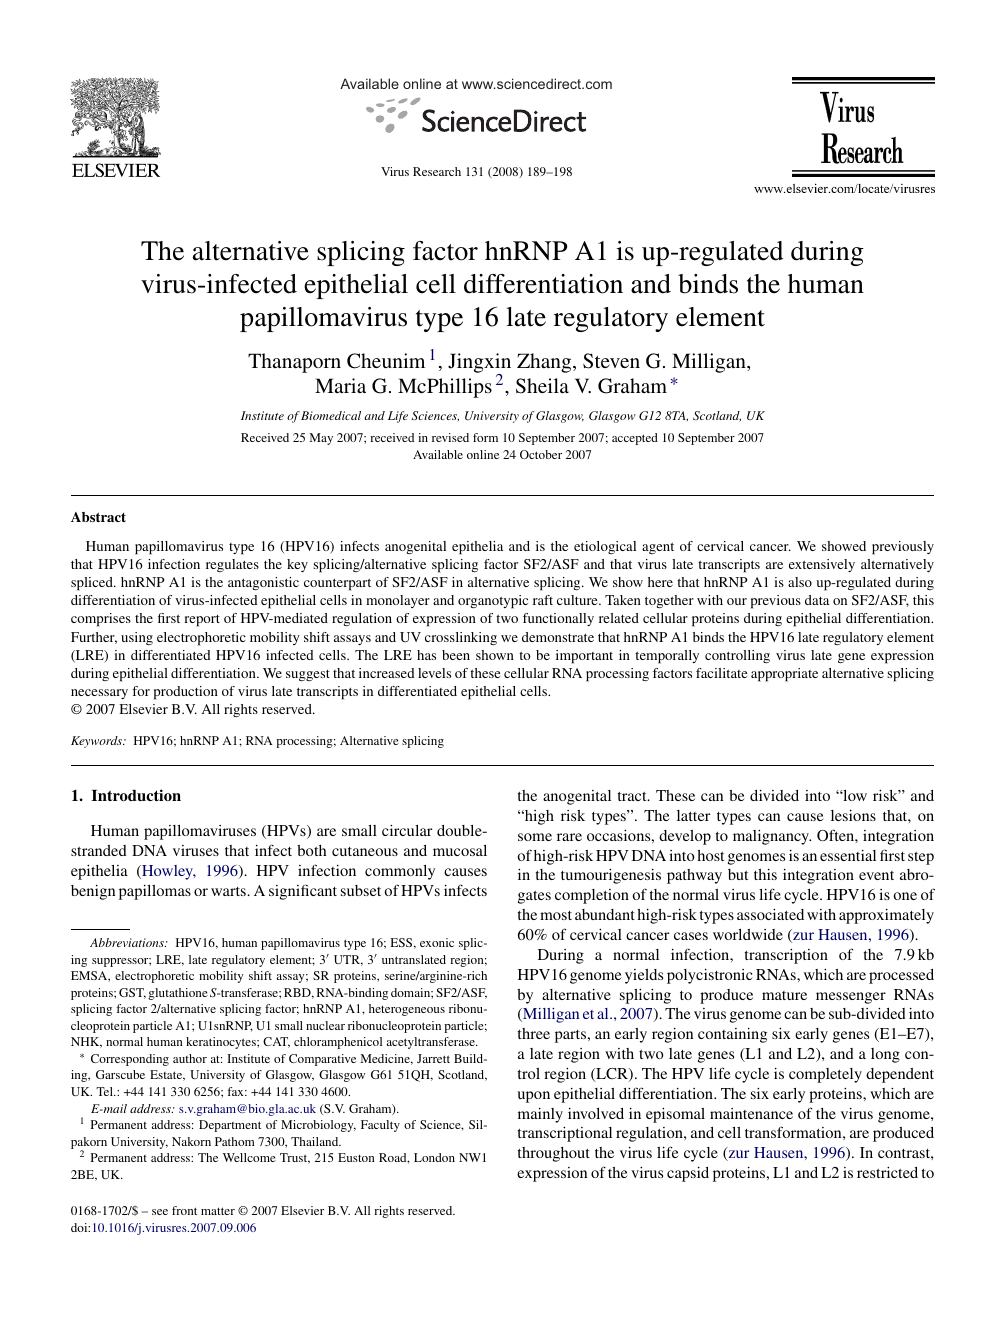 hpv virus stamm 16